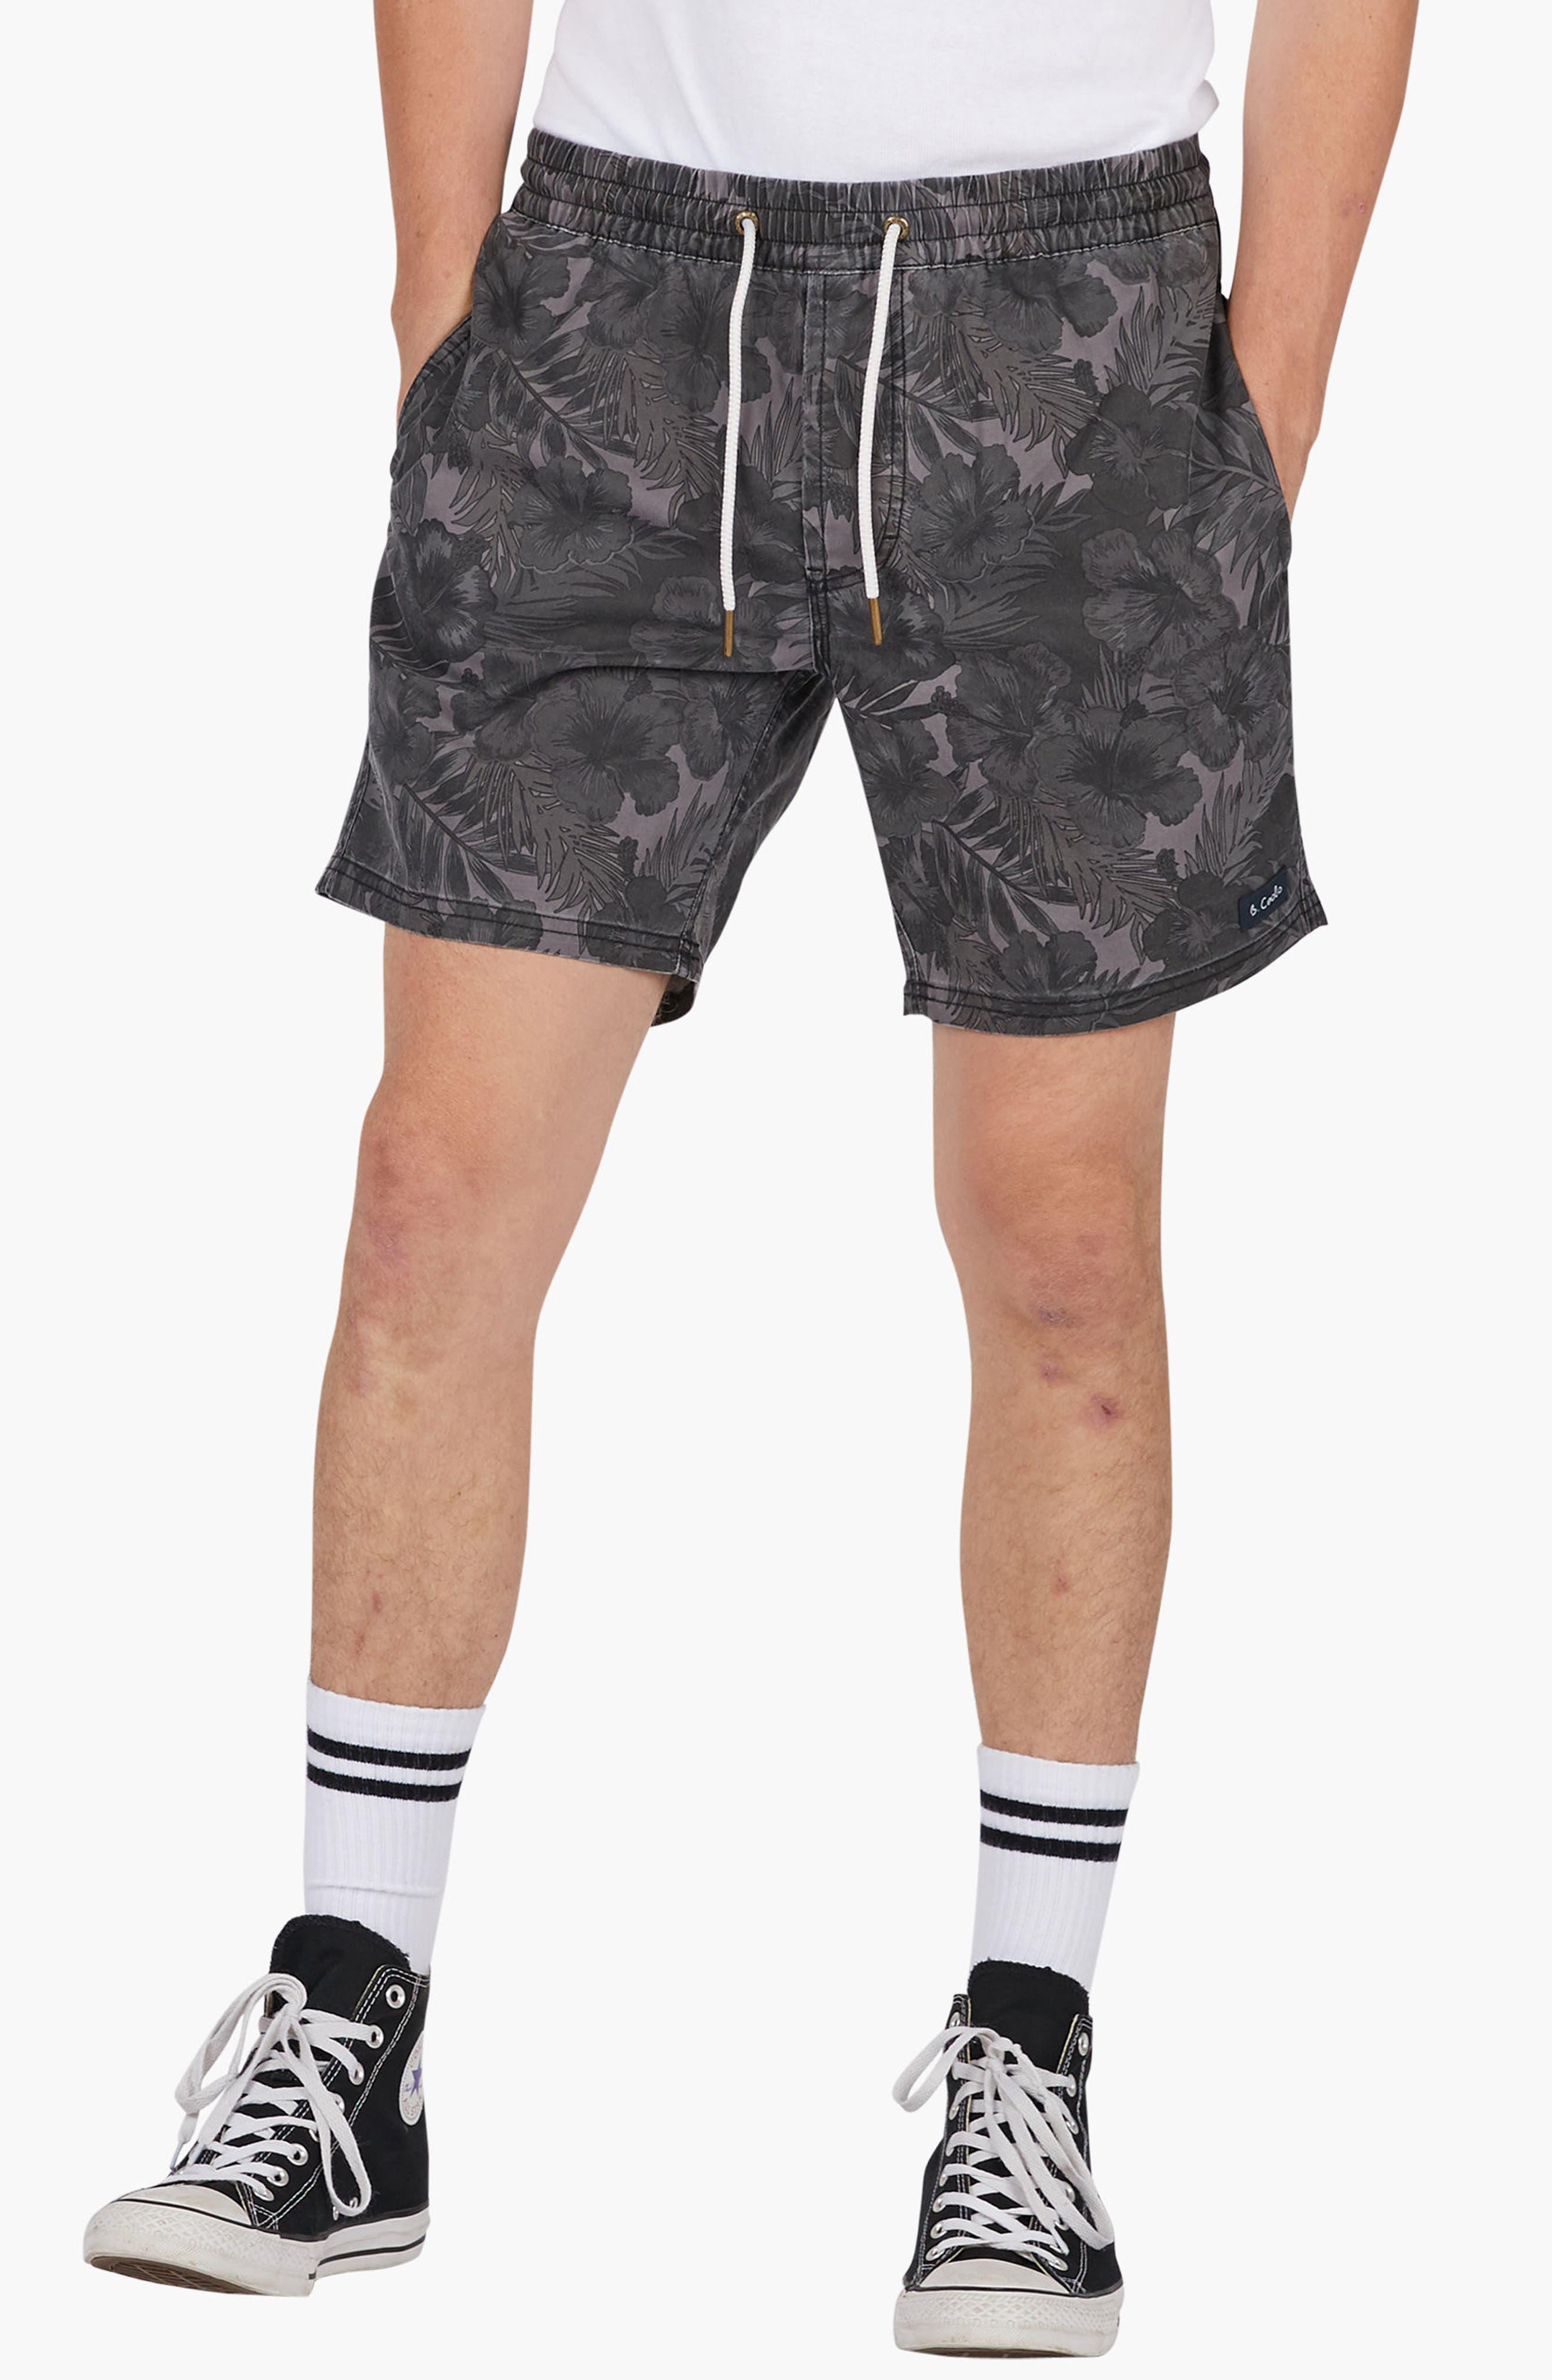 Amphibious Shorts,                             Alternate thumbnail 4, color,                             001